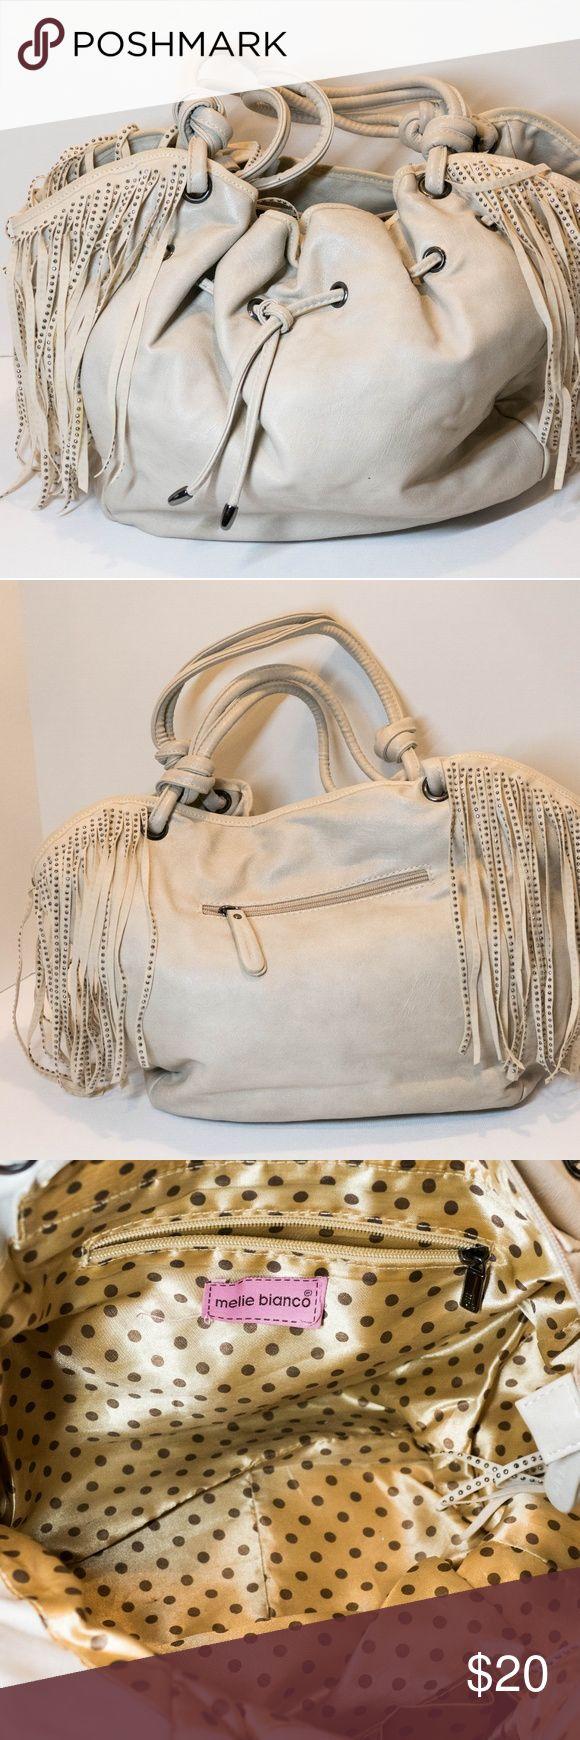 melie bianco Tassel Studded hobo bag cream melie bianco Tassel Studded hobo bag 12in x 6 x 11in Melie Bianco Bags Hobos